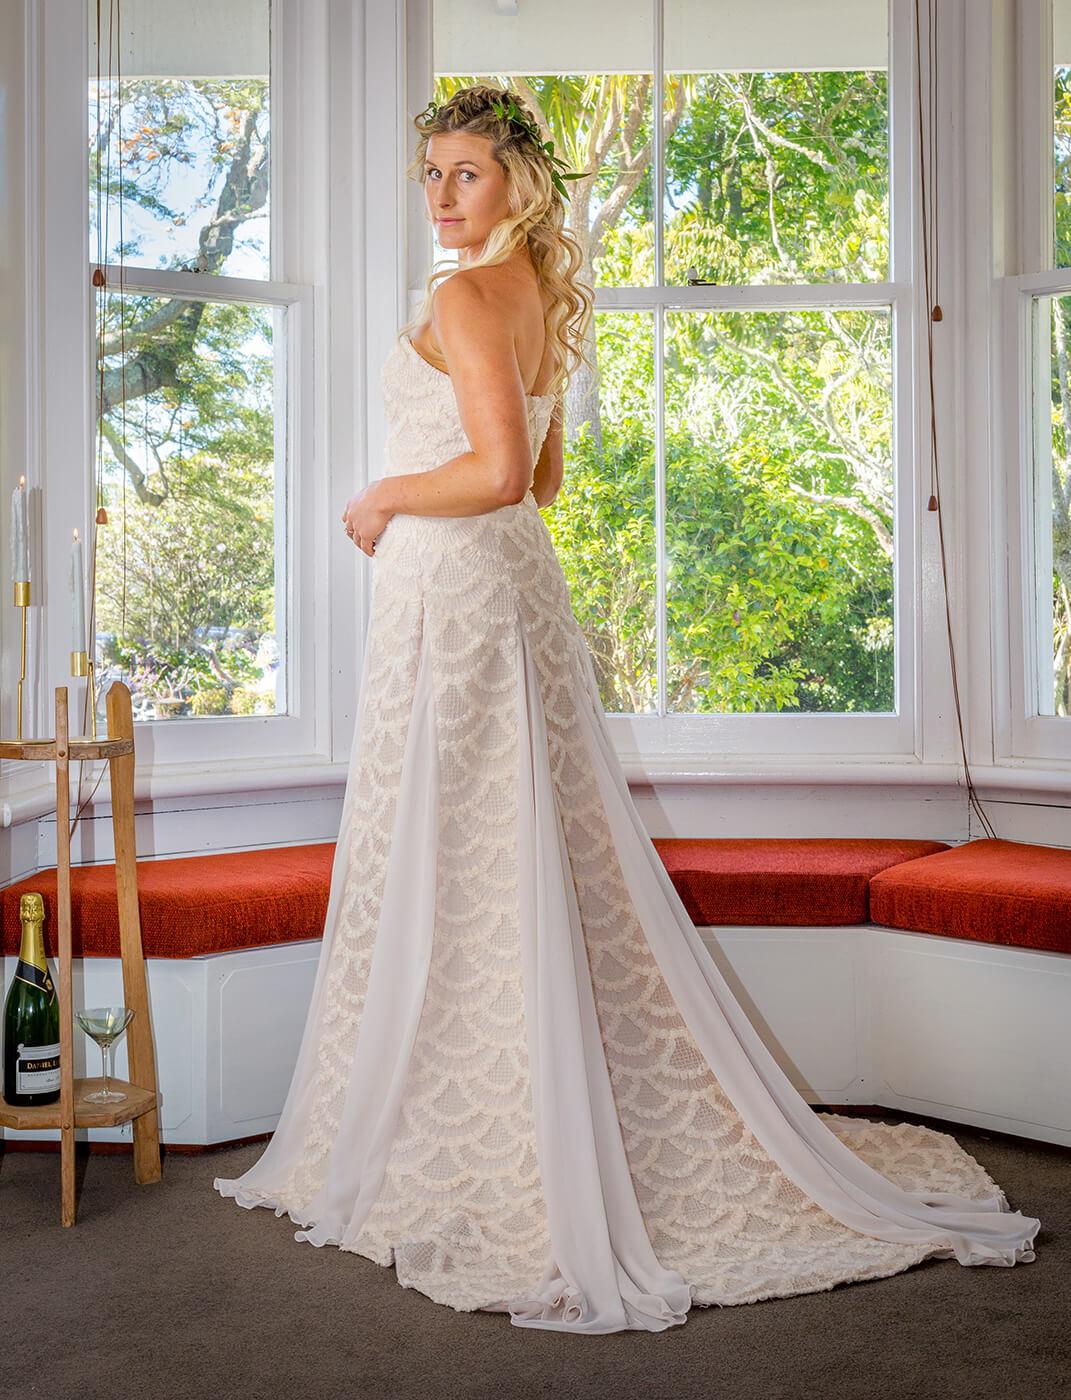 elizabeth may bridal honour collection 3.jpg